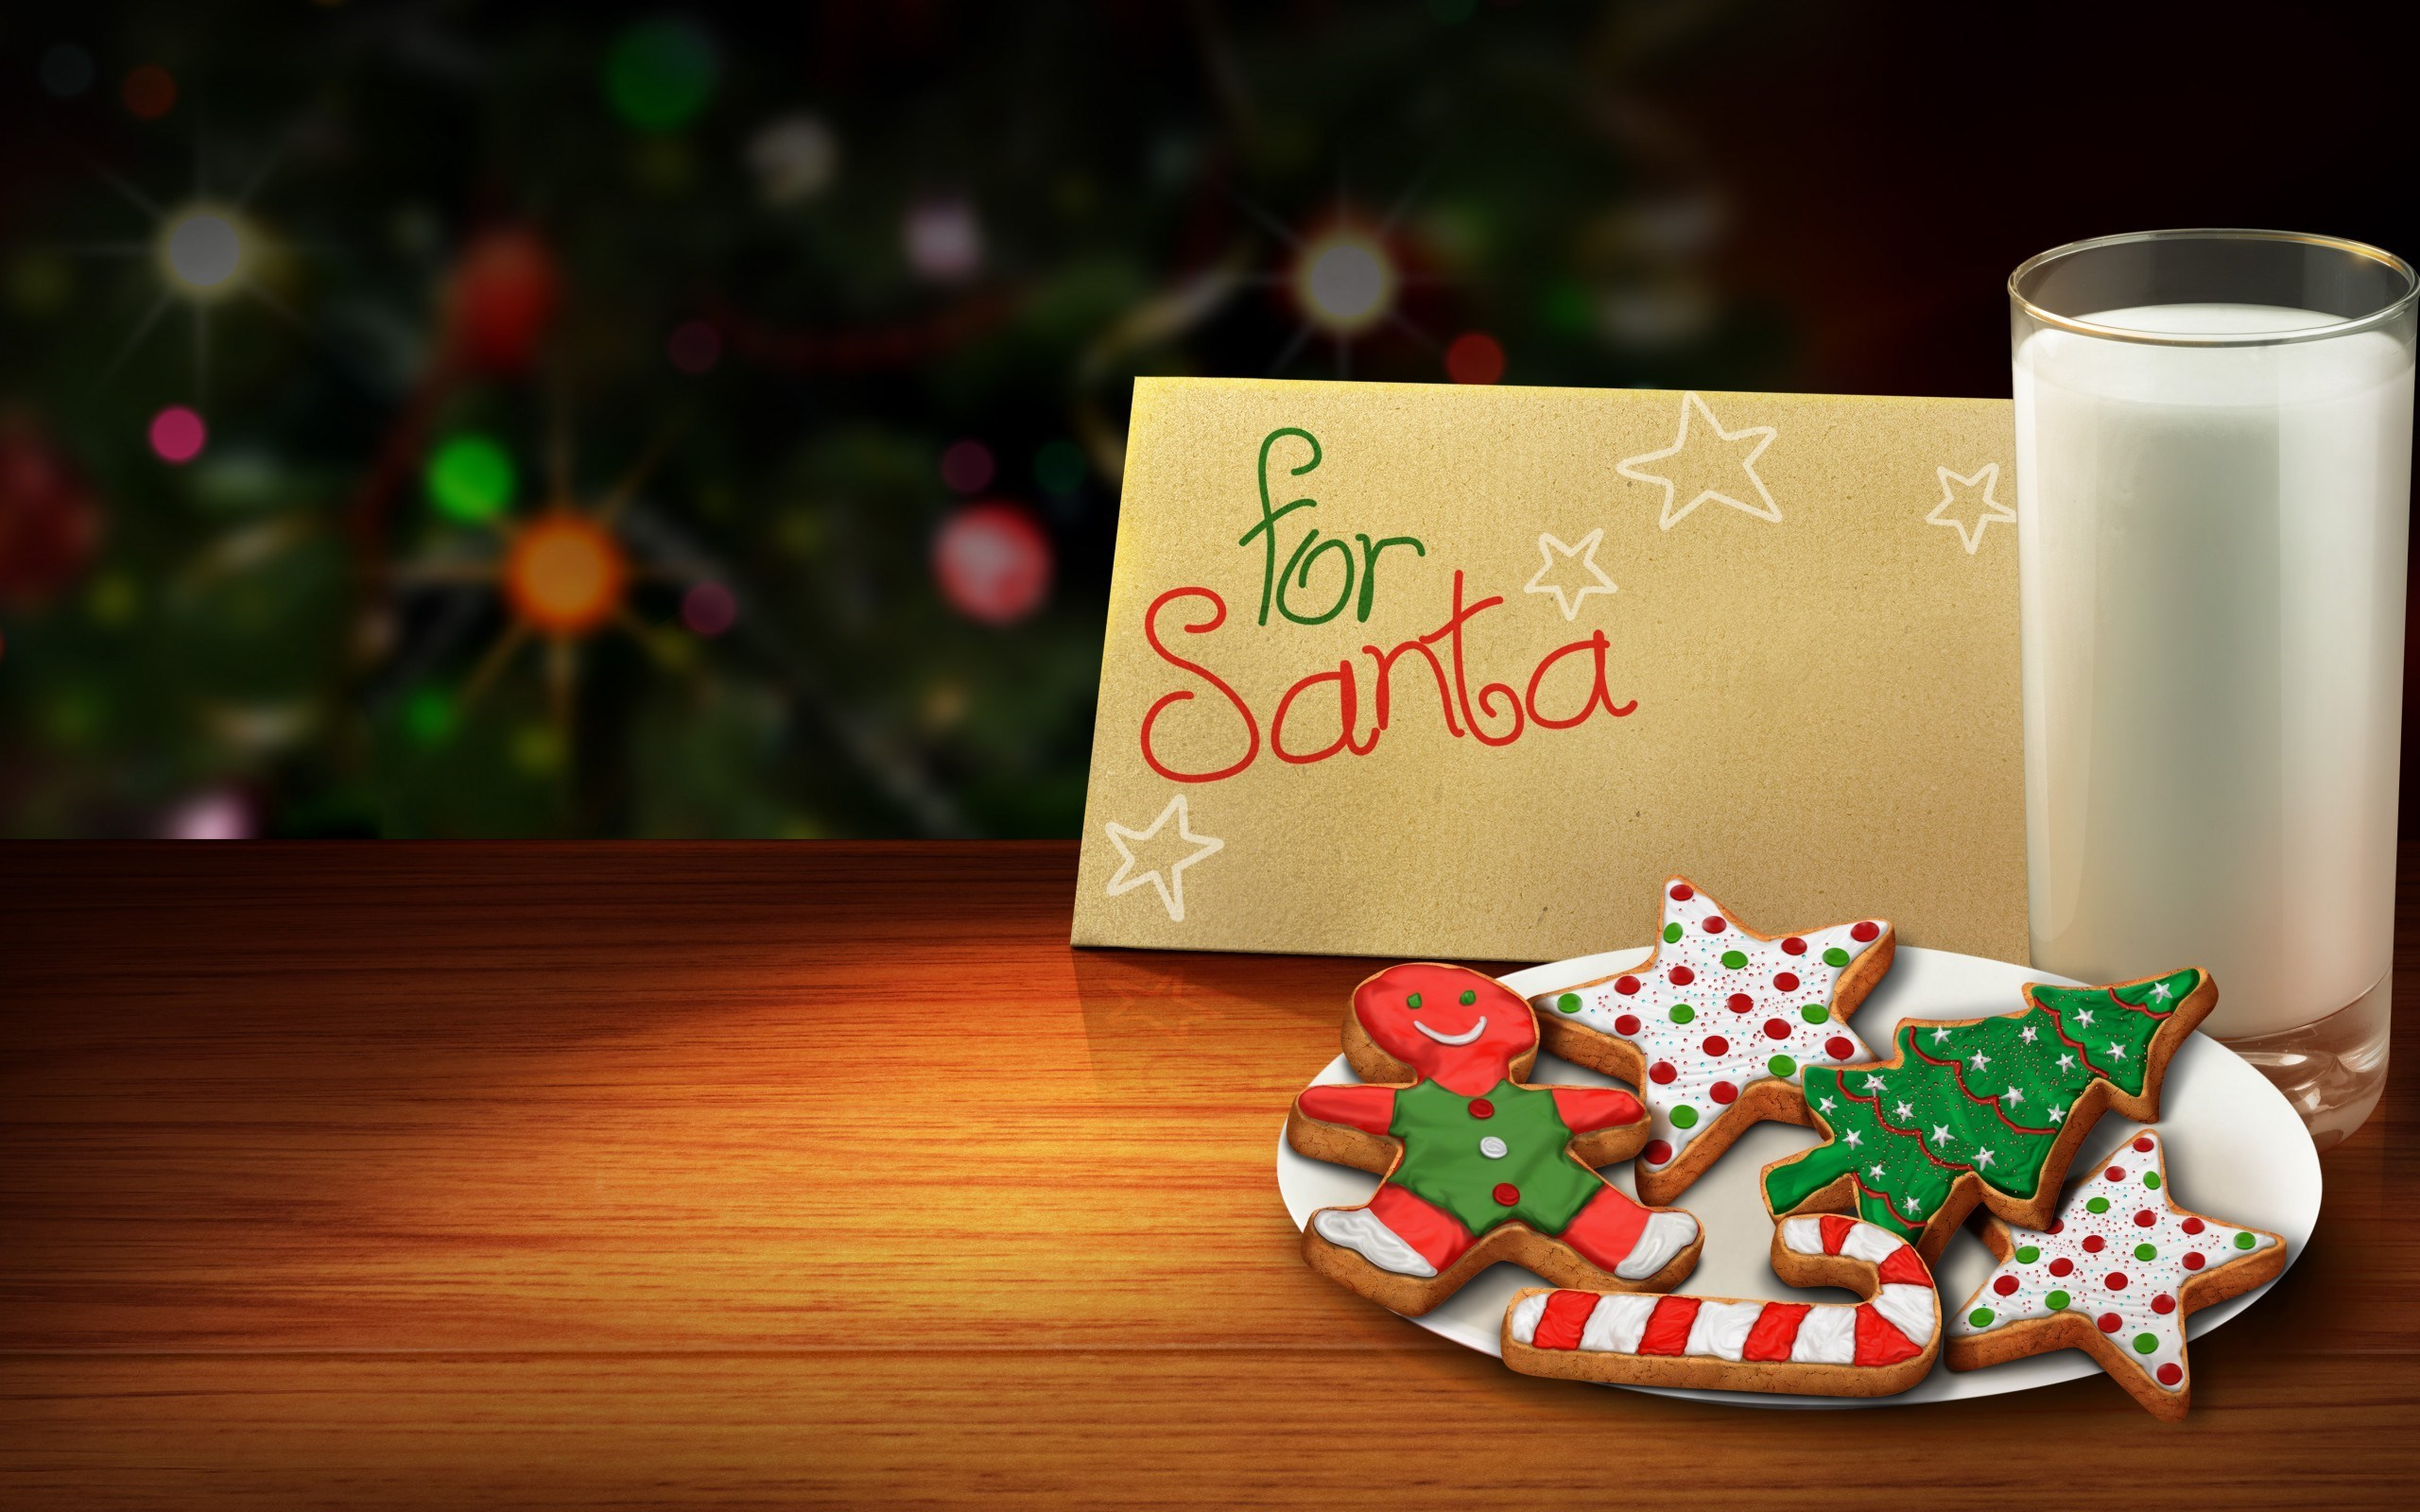 Cookies for Santa Christmas Tree Happy New Year